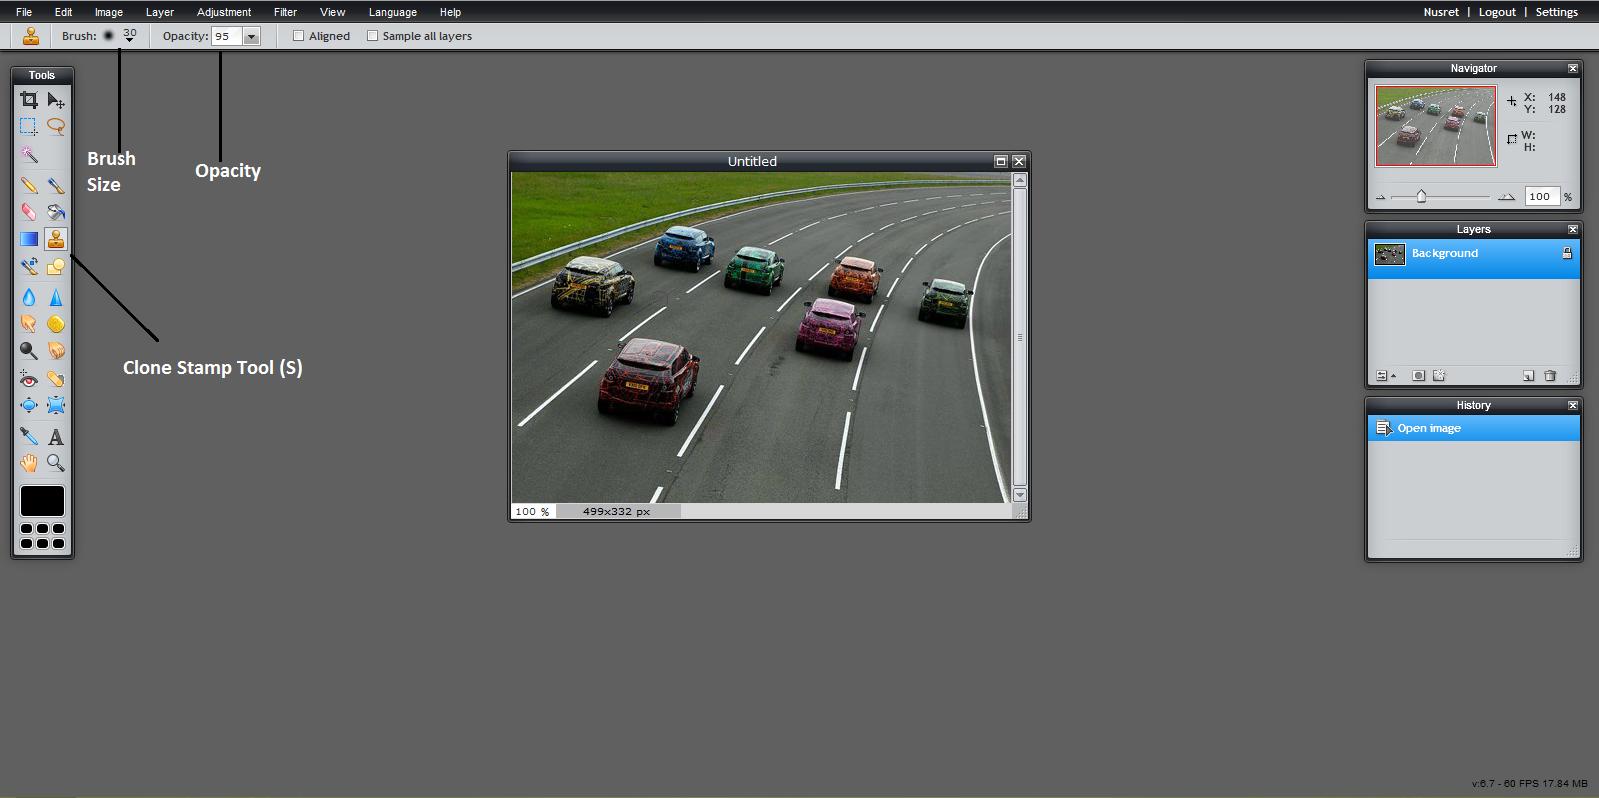 Photo Editing - Photo Editing Lessons - Pixlr Lessons - Pixlr